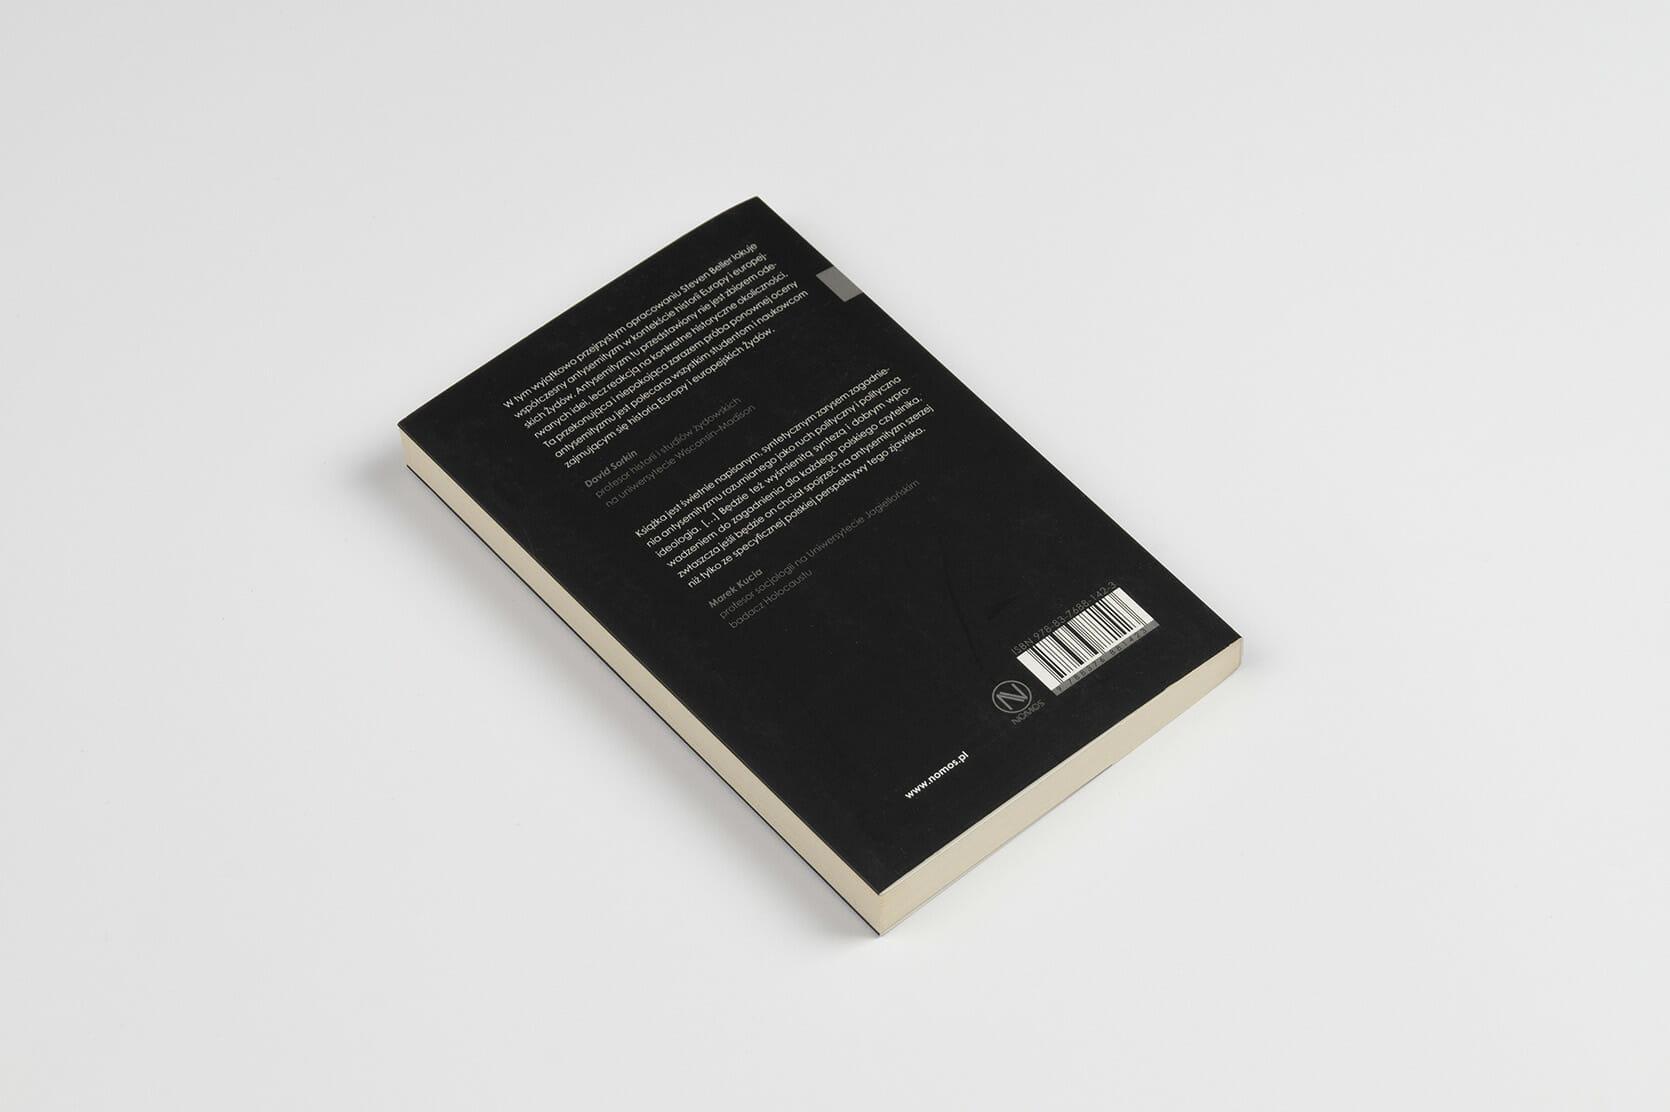 Antysemitism - book cover - beller